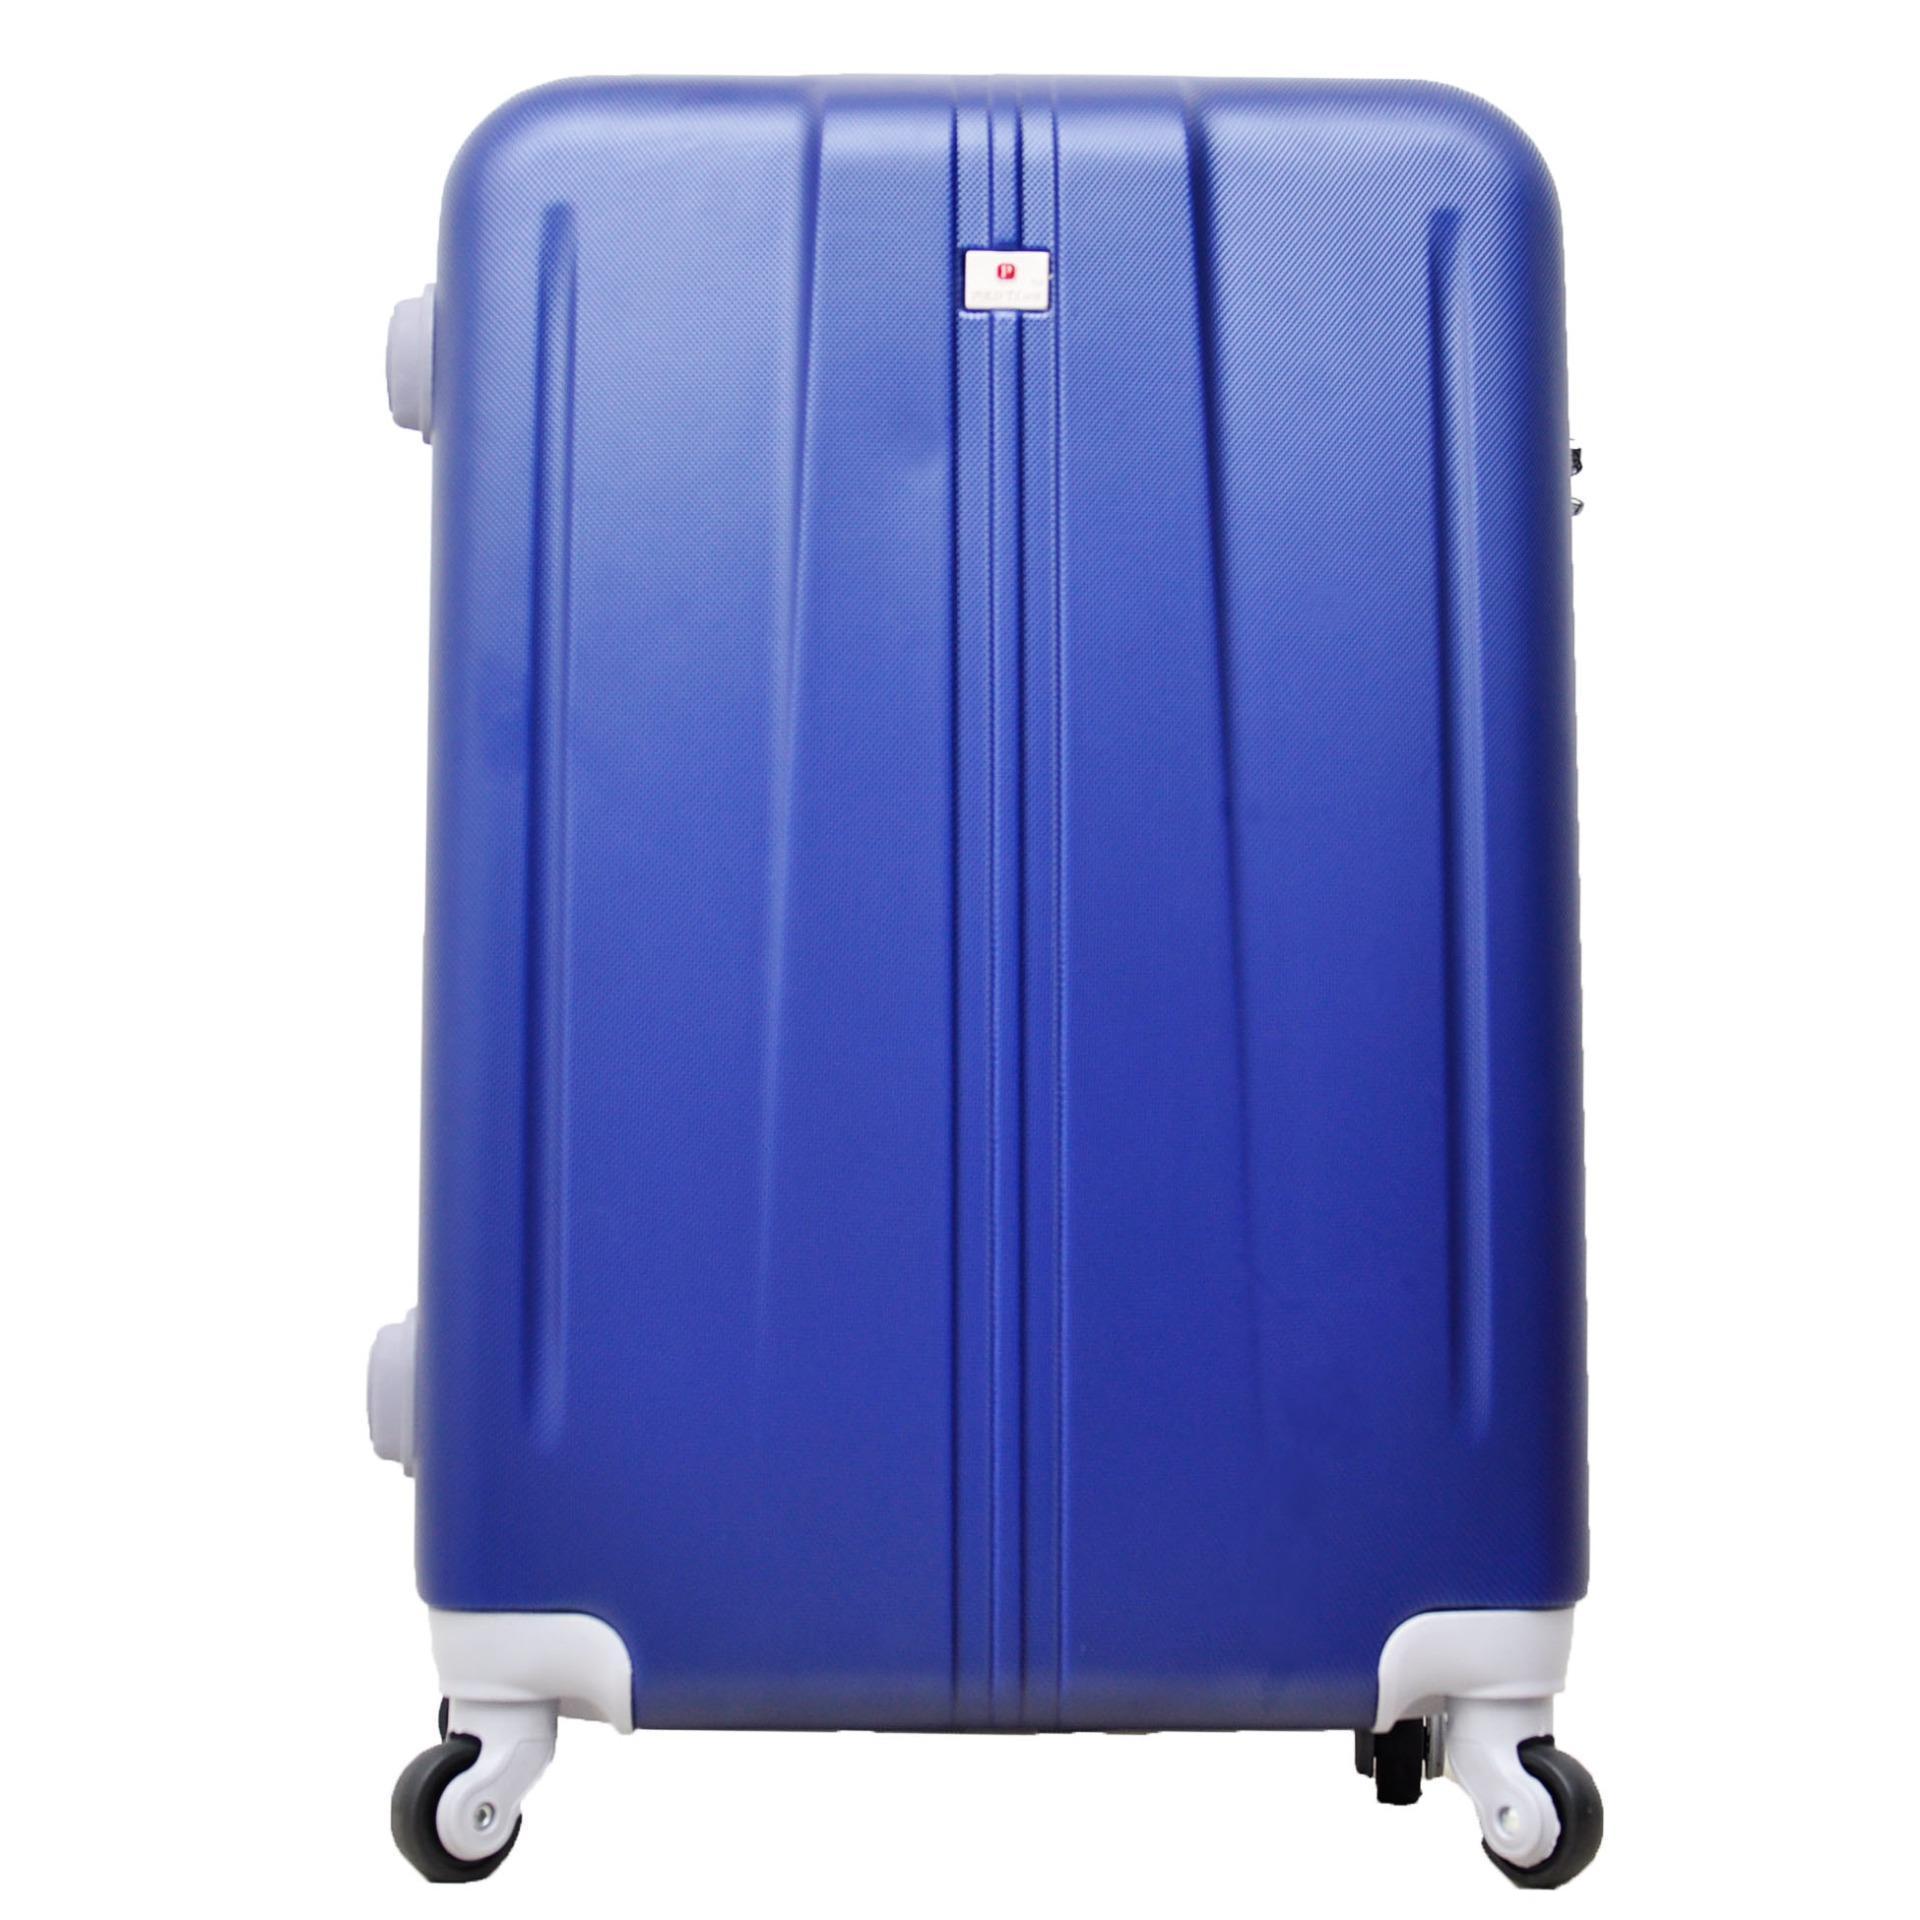 Polo Team Tas Koper Hardcase Kabin Size 20 Inch 003 Biru Tua Promo Beli 1 Gratis 1